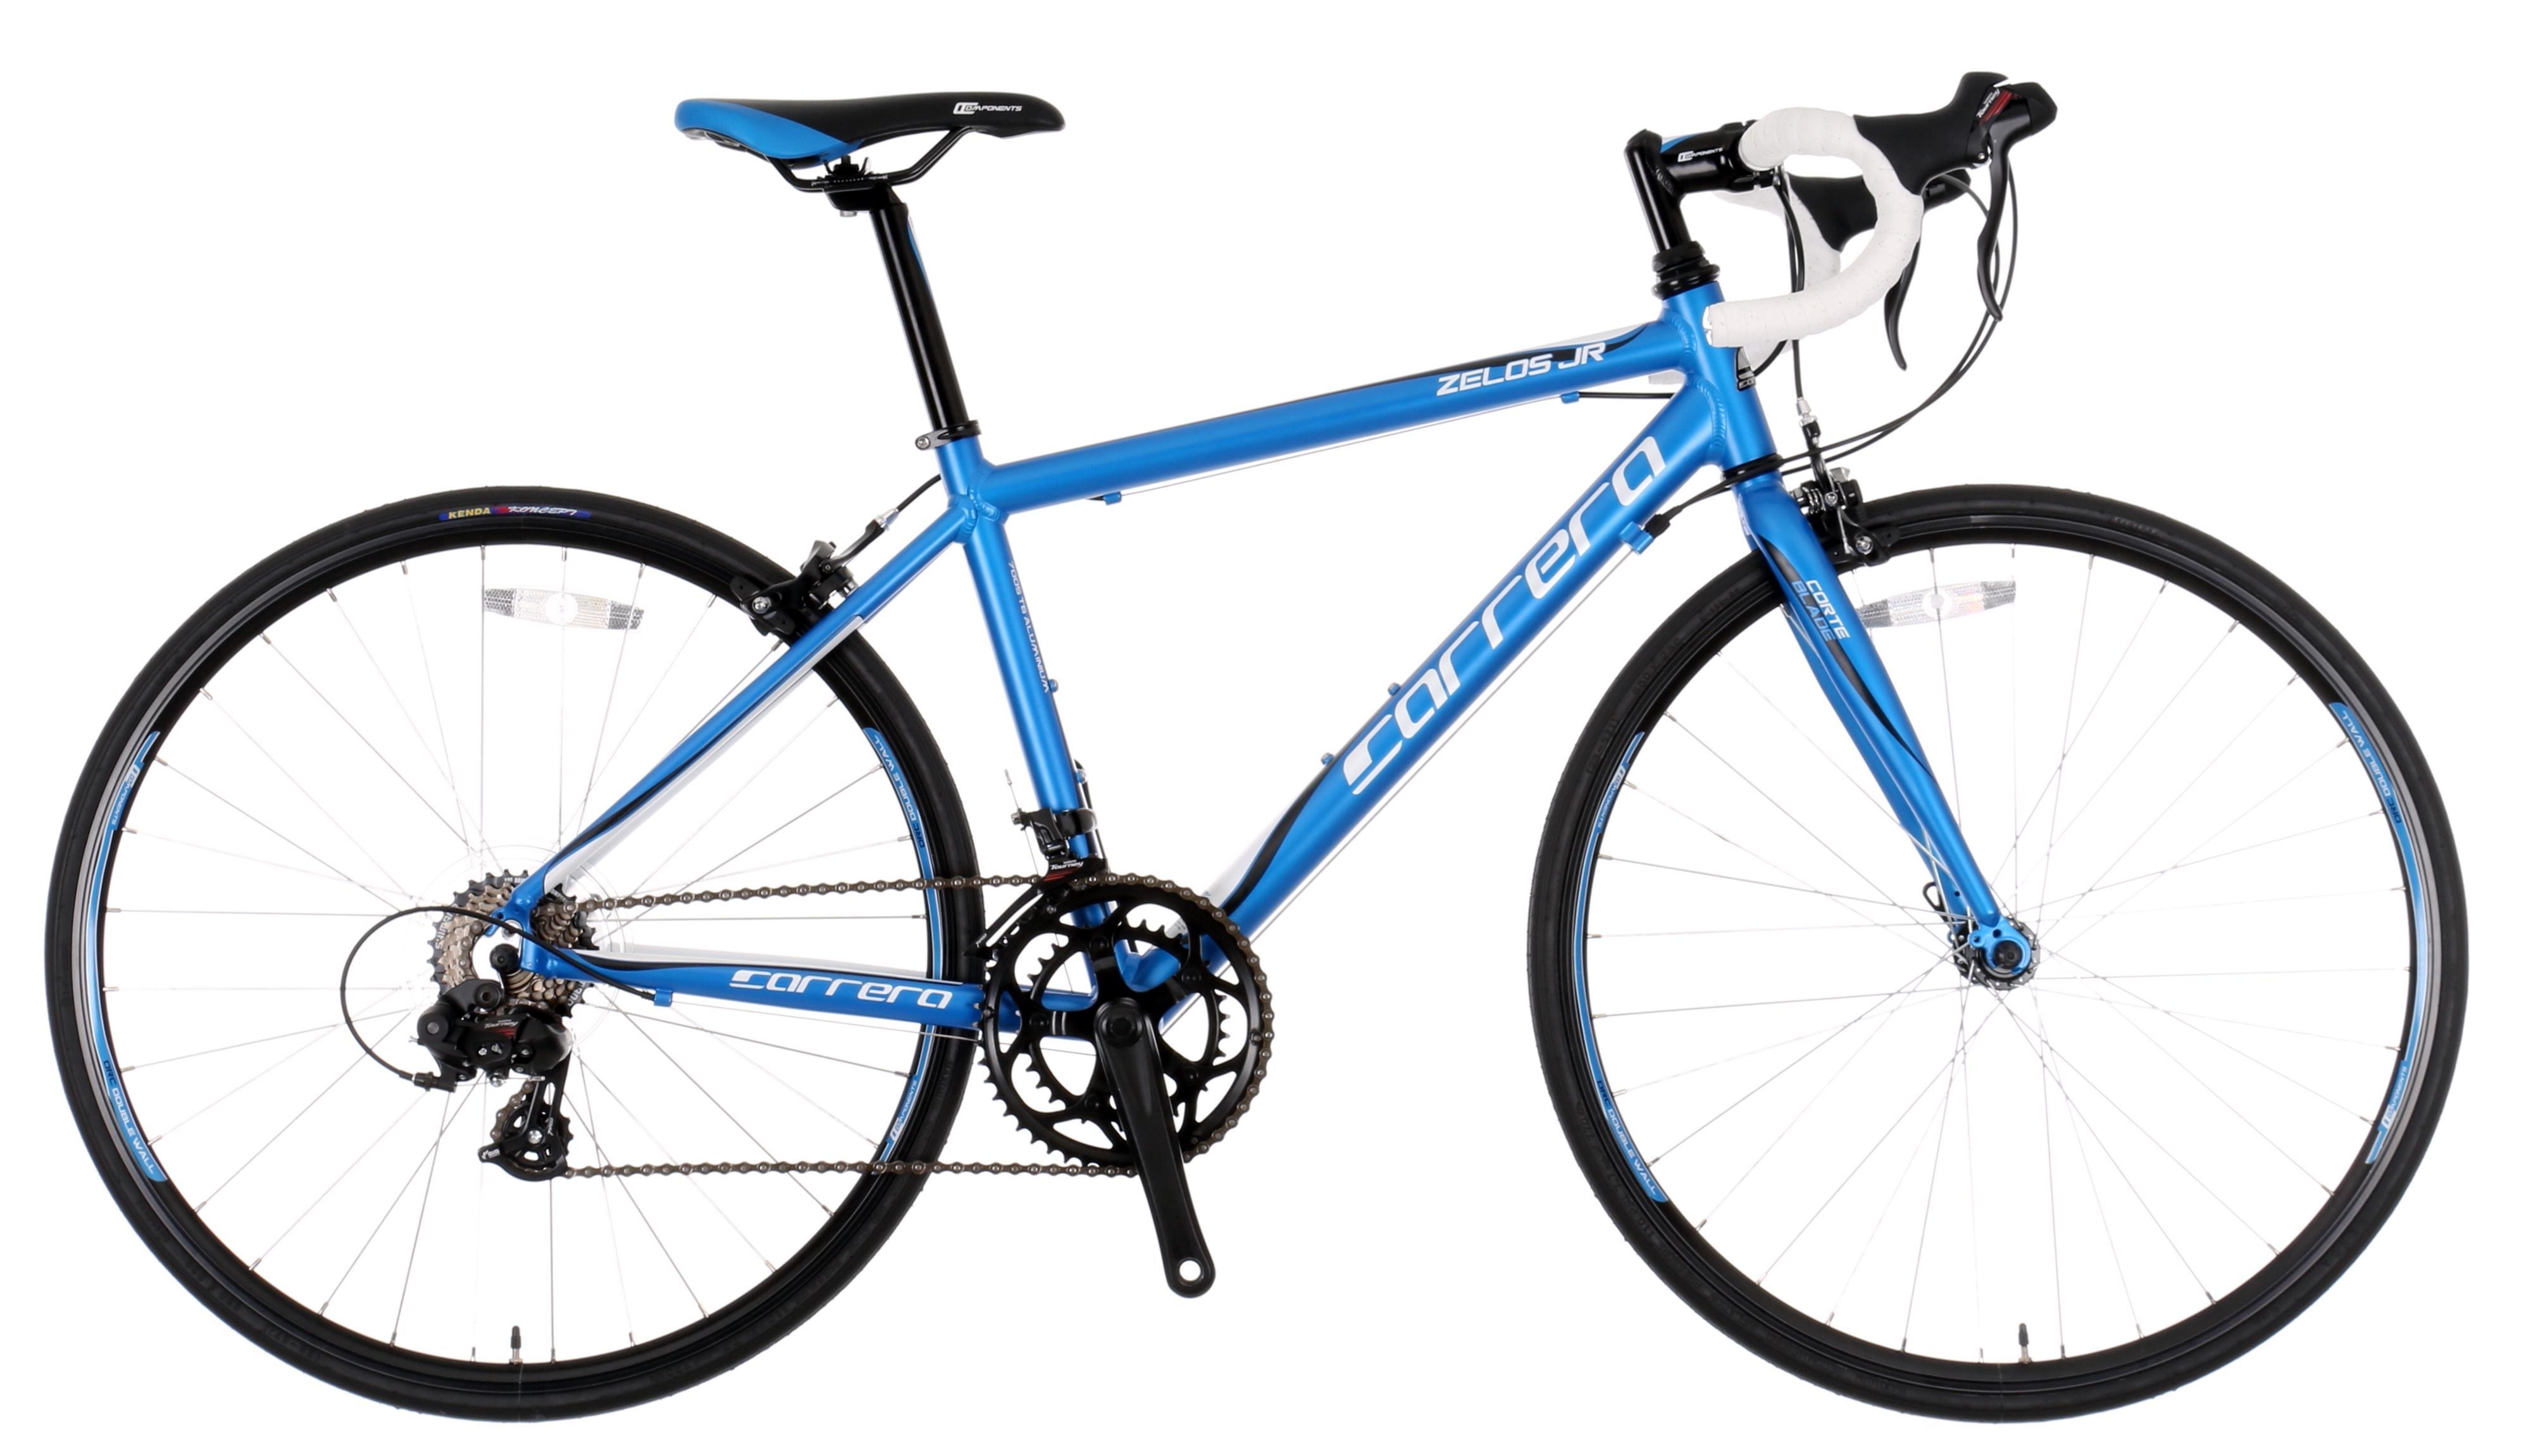 Details about Carrera Zelos Junior Boys Kids Road Racing Bike 41cm  Aluminium Frame 14 Speed